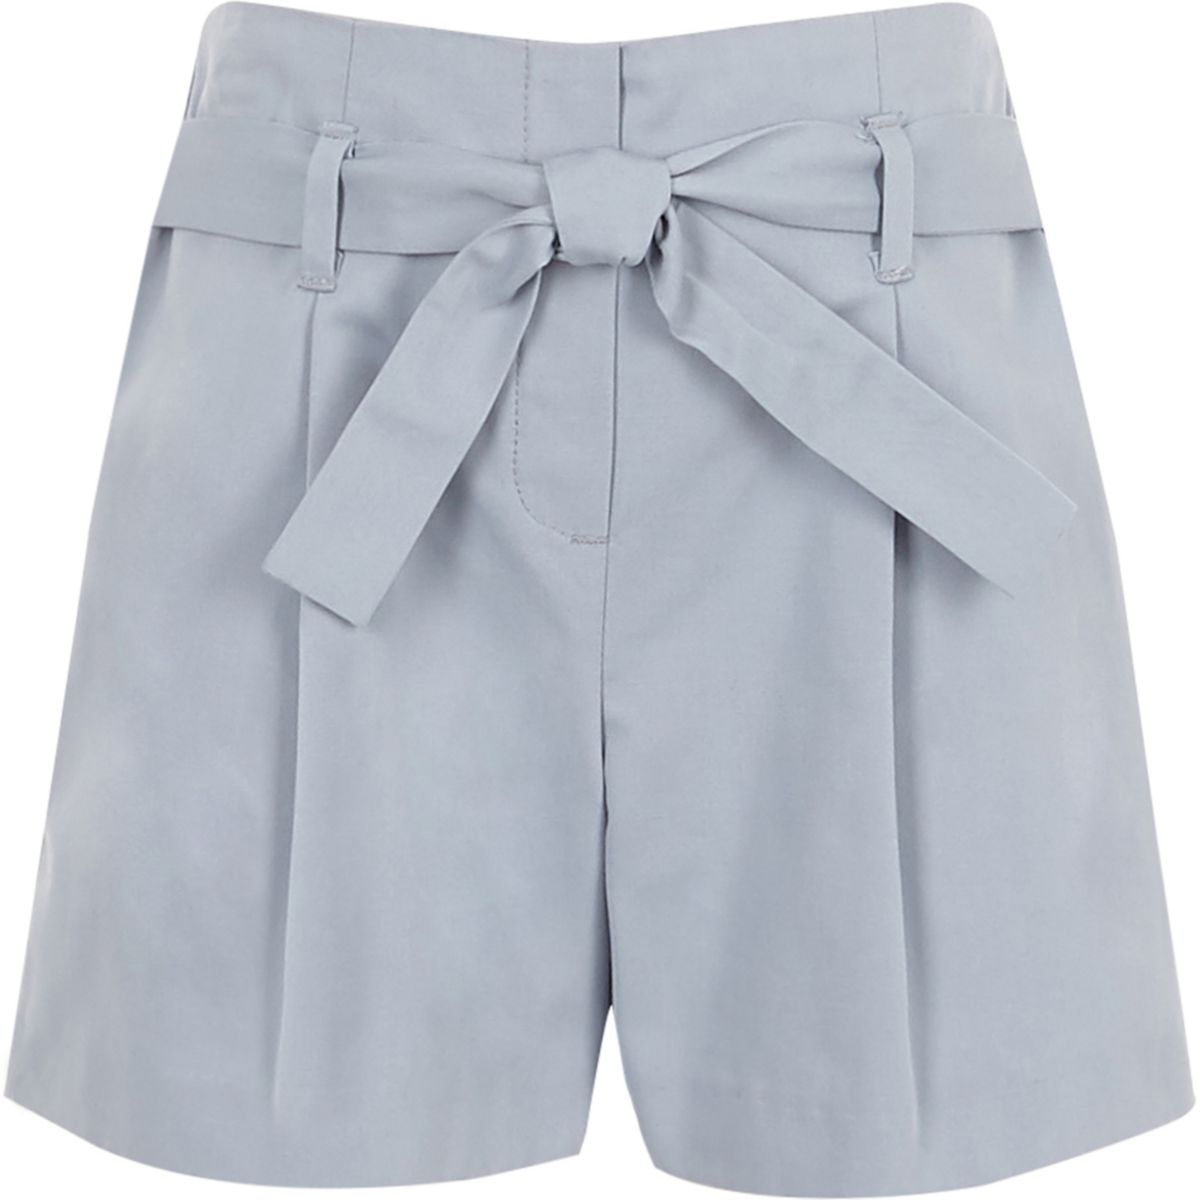 Girls blue poplin tie front shorts